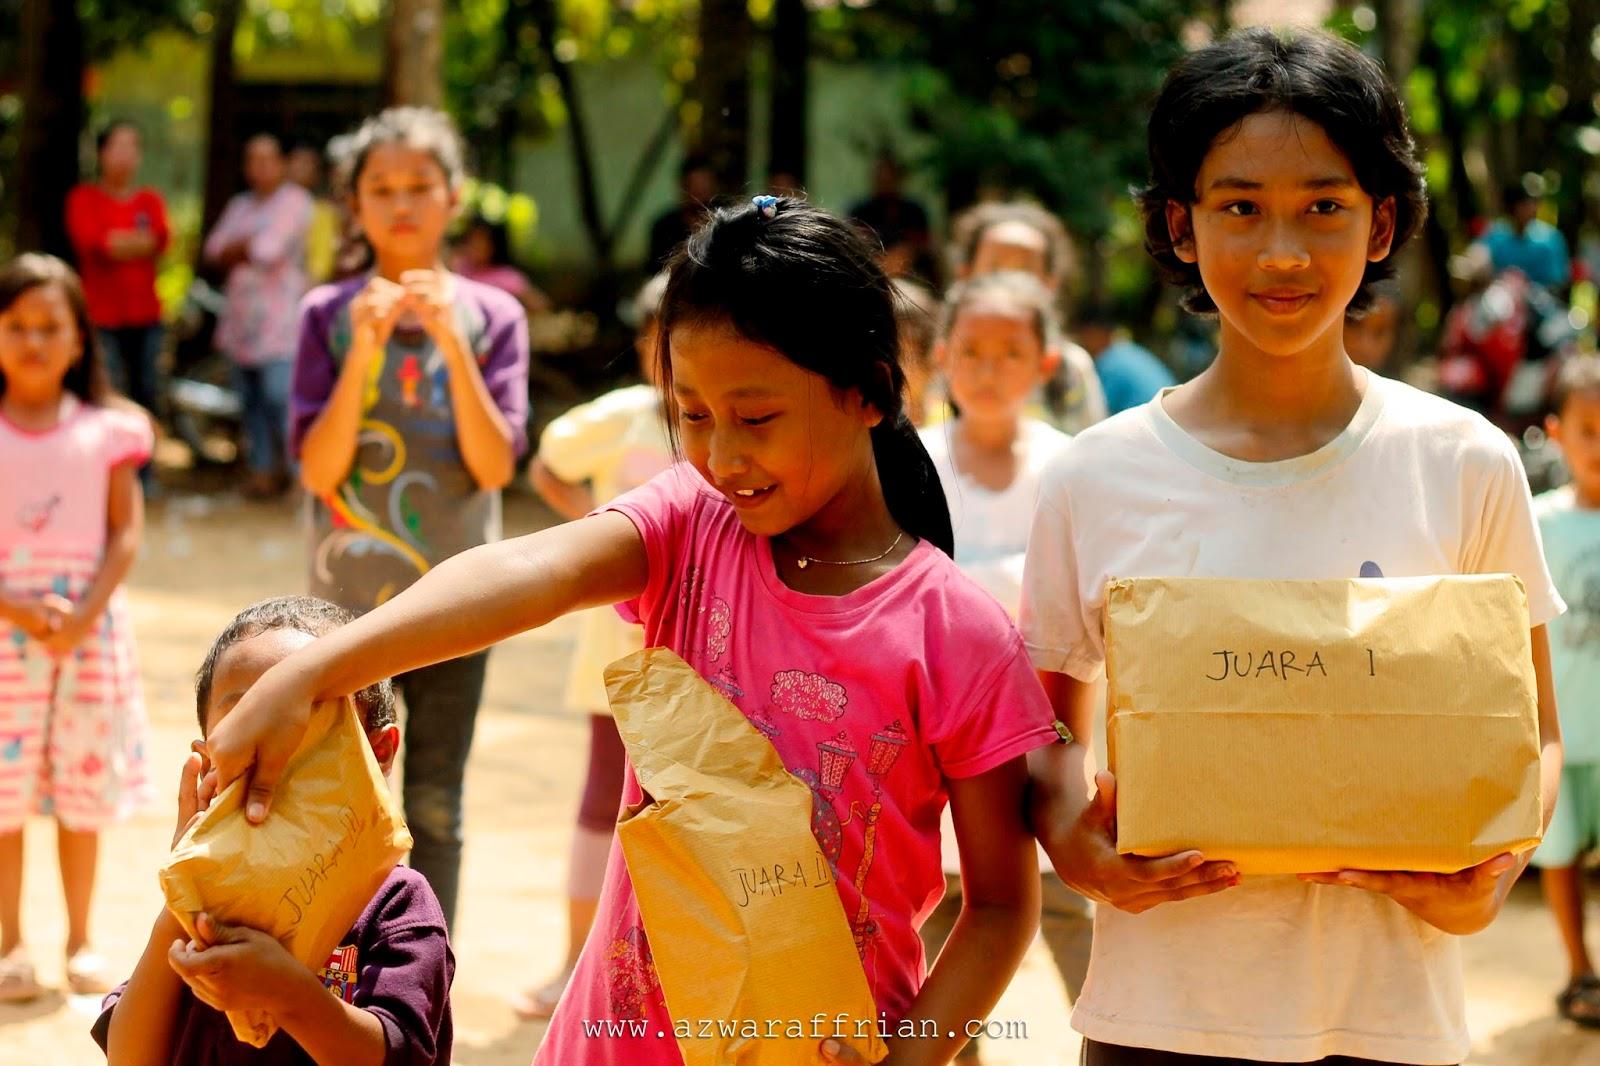 Meriahnya Lomba 17an Ke71 Di Srobyong Jepara Azwar Affrian